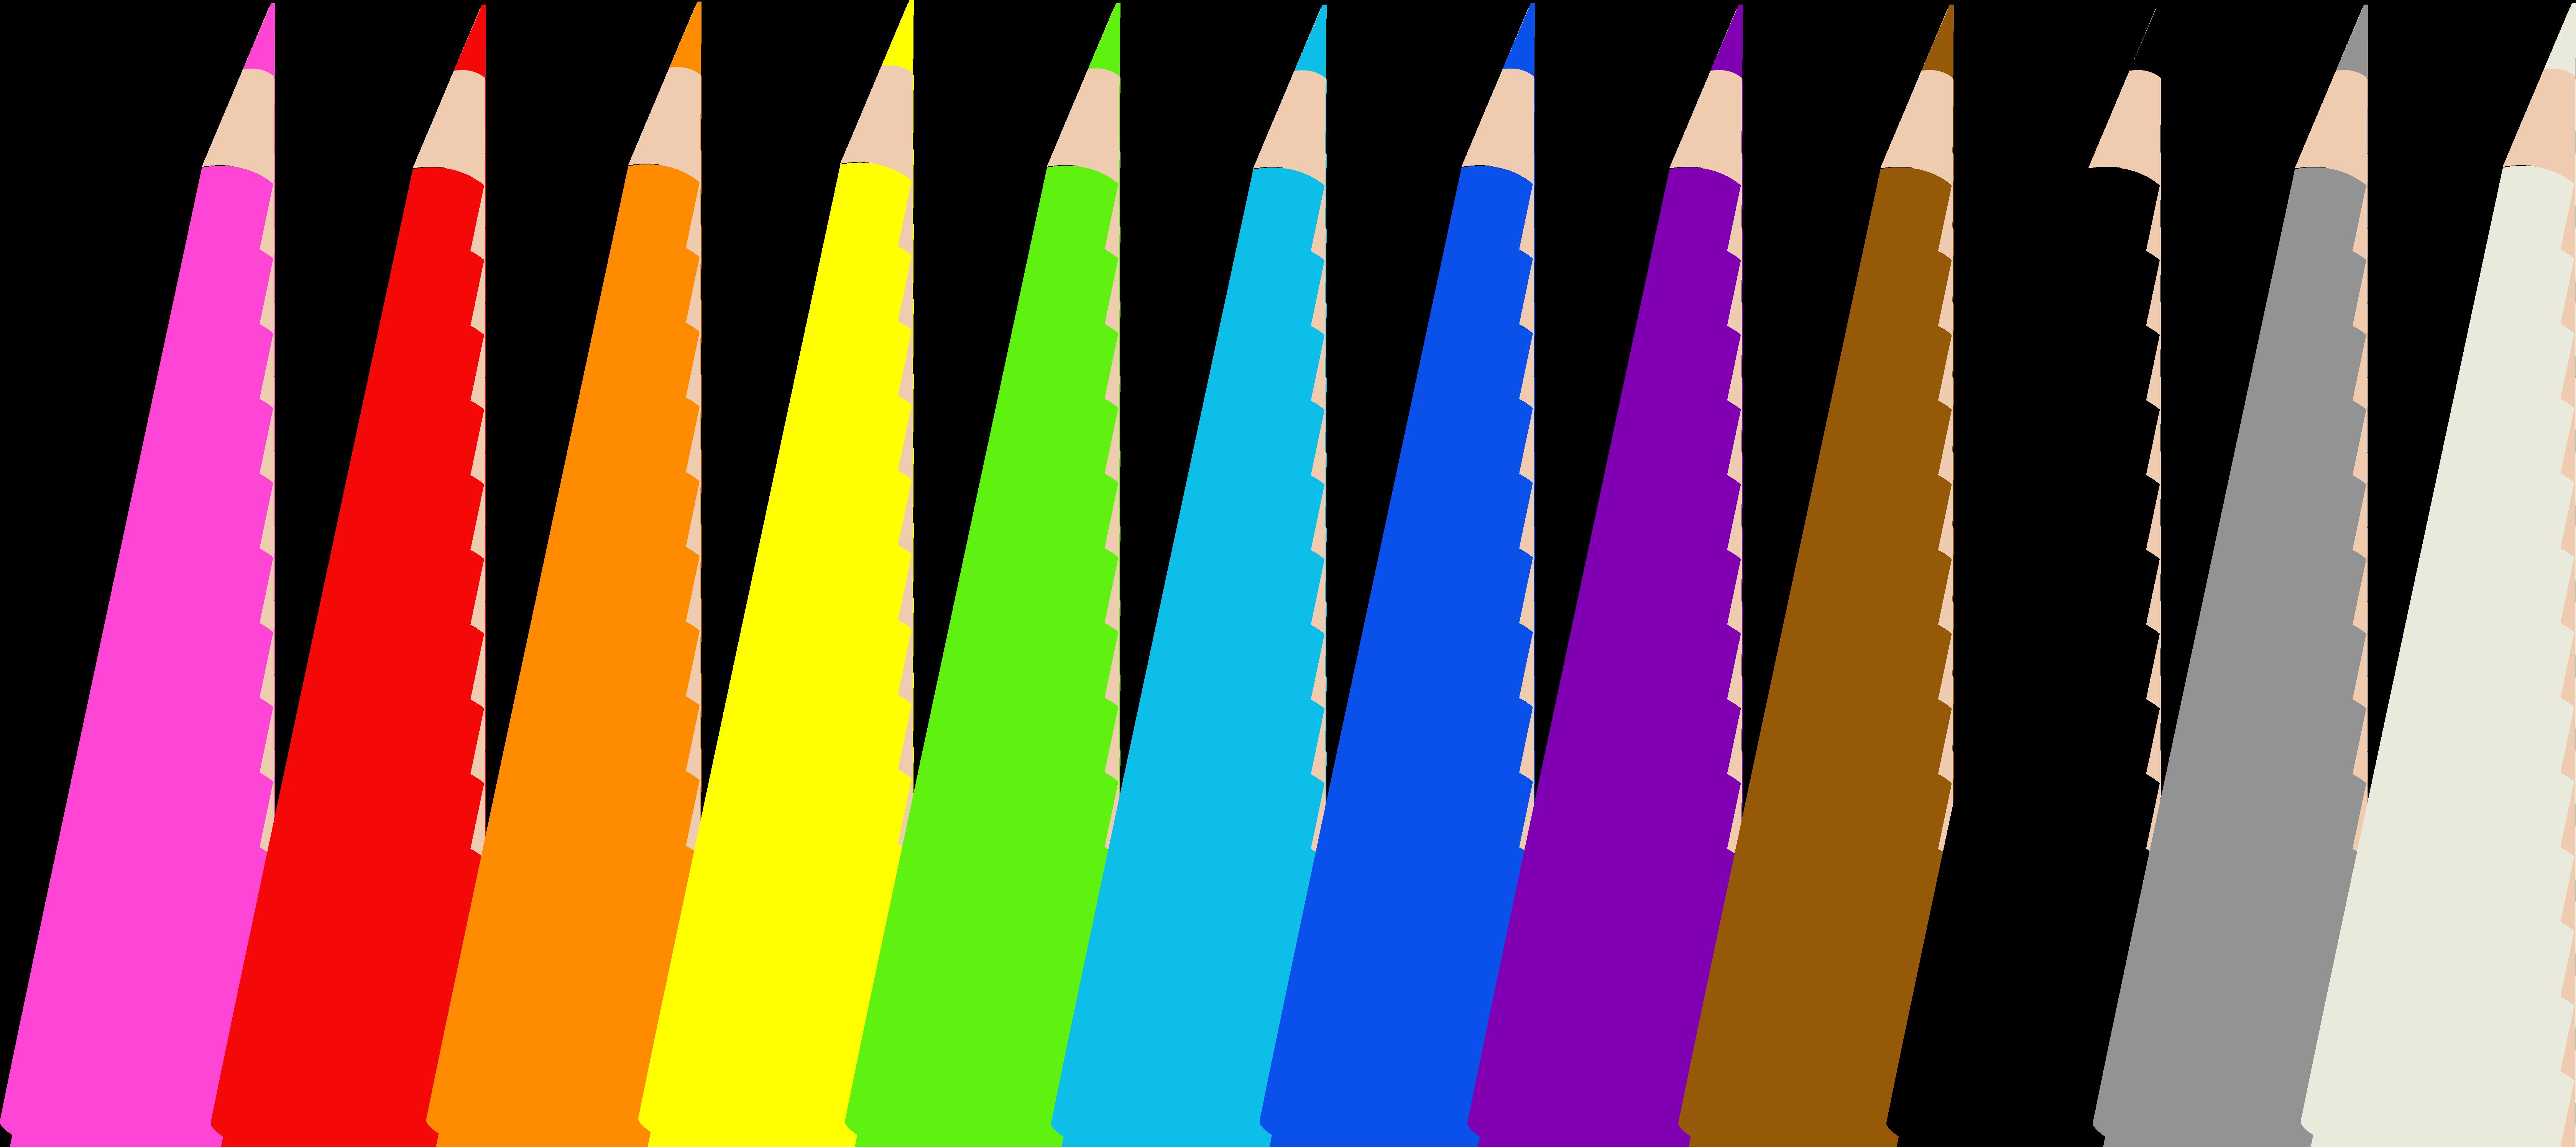 Pencil Border Clipart | Clipart Panda - Free Clipart Images